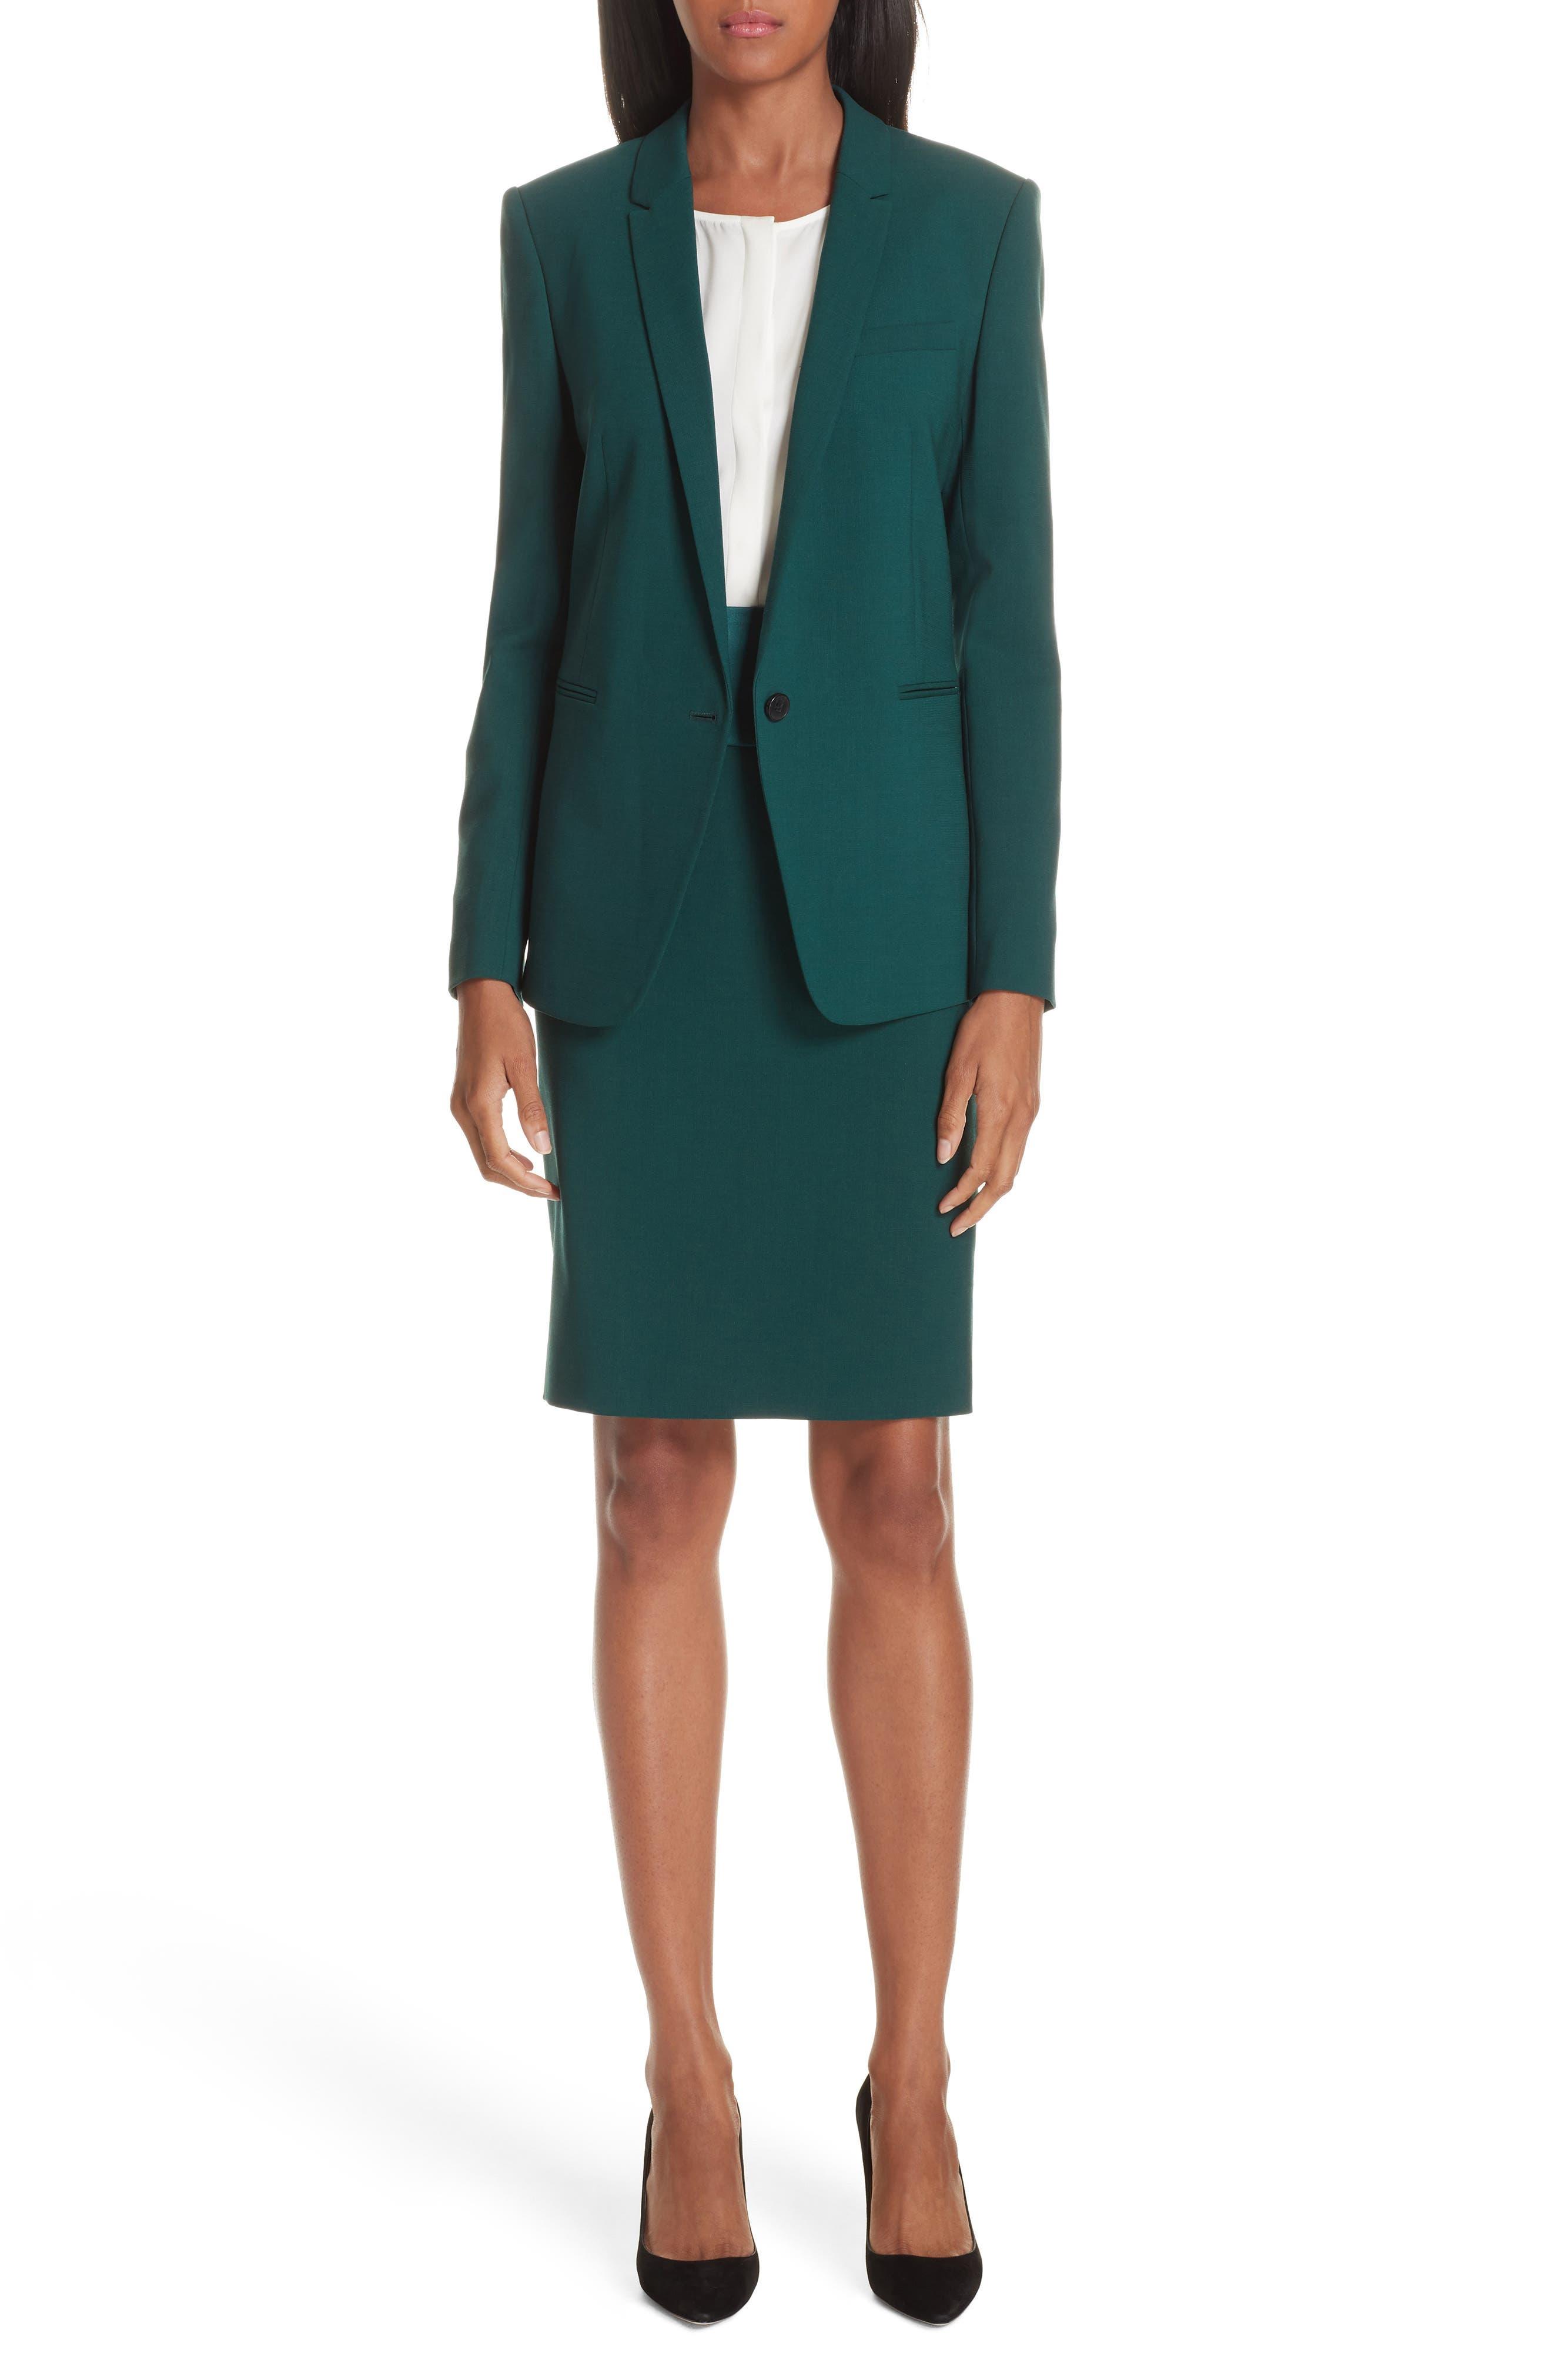 Vanufa Stretch Wool Suit Skirt,                             Alternate thumbnail 7, color,                             PINE GREEN